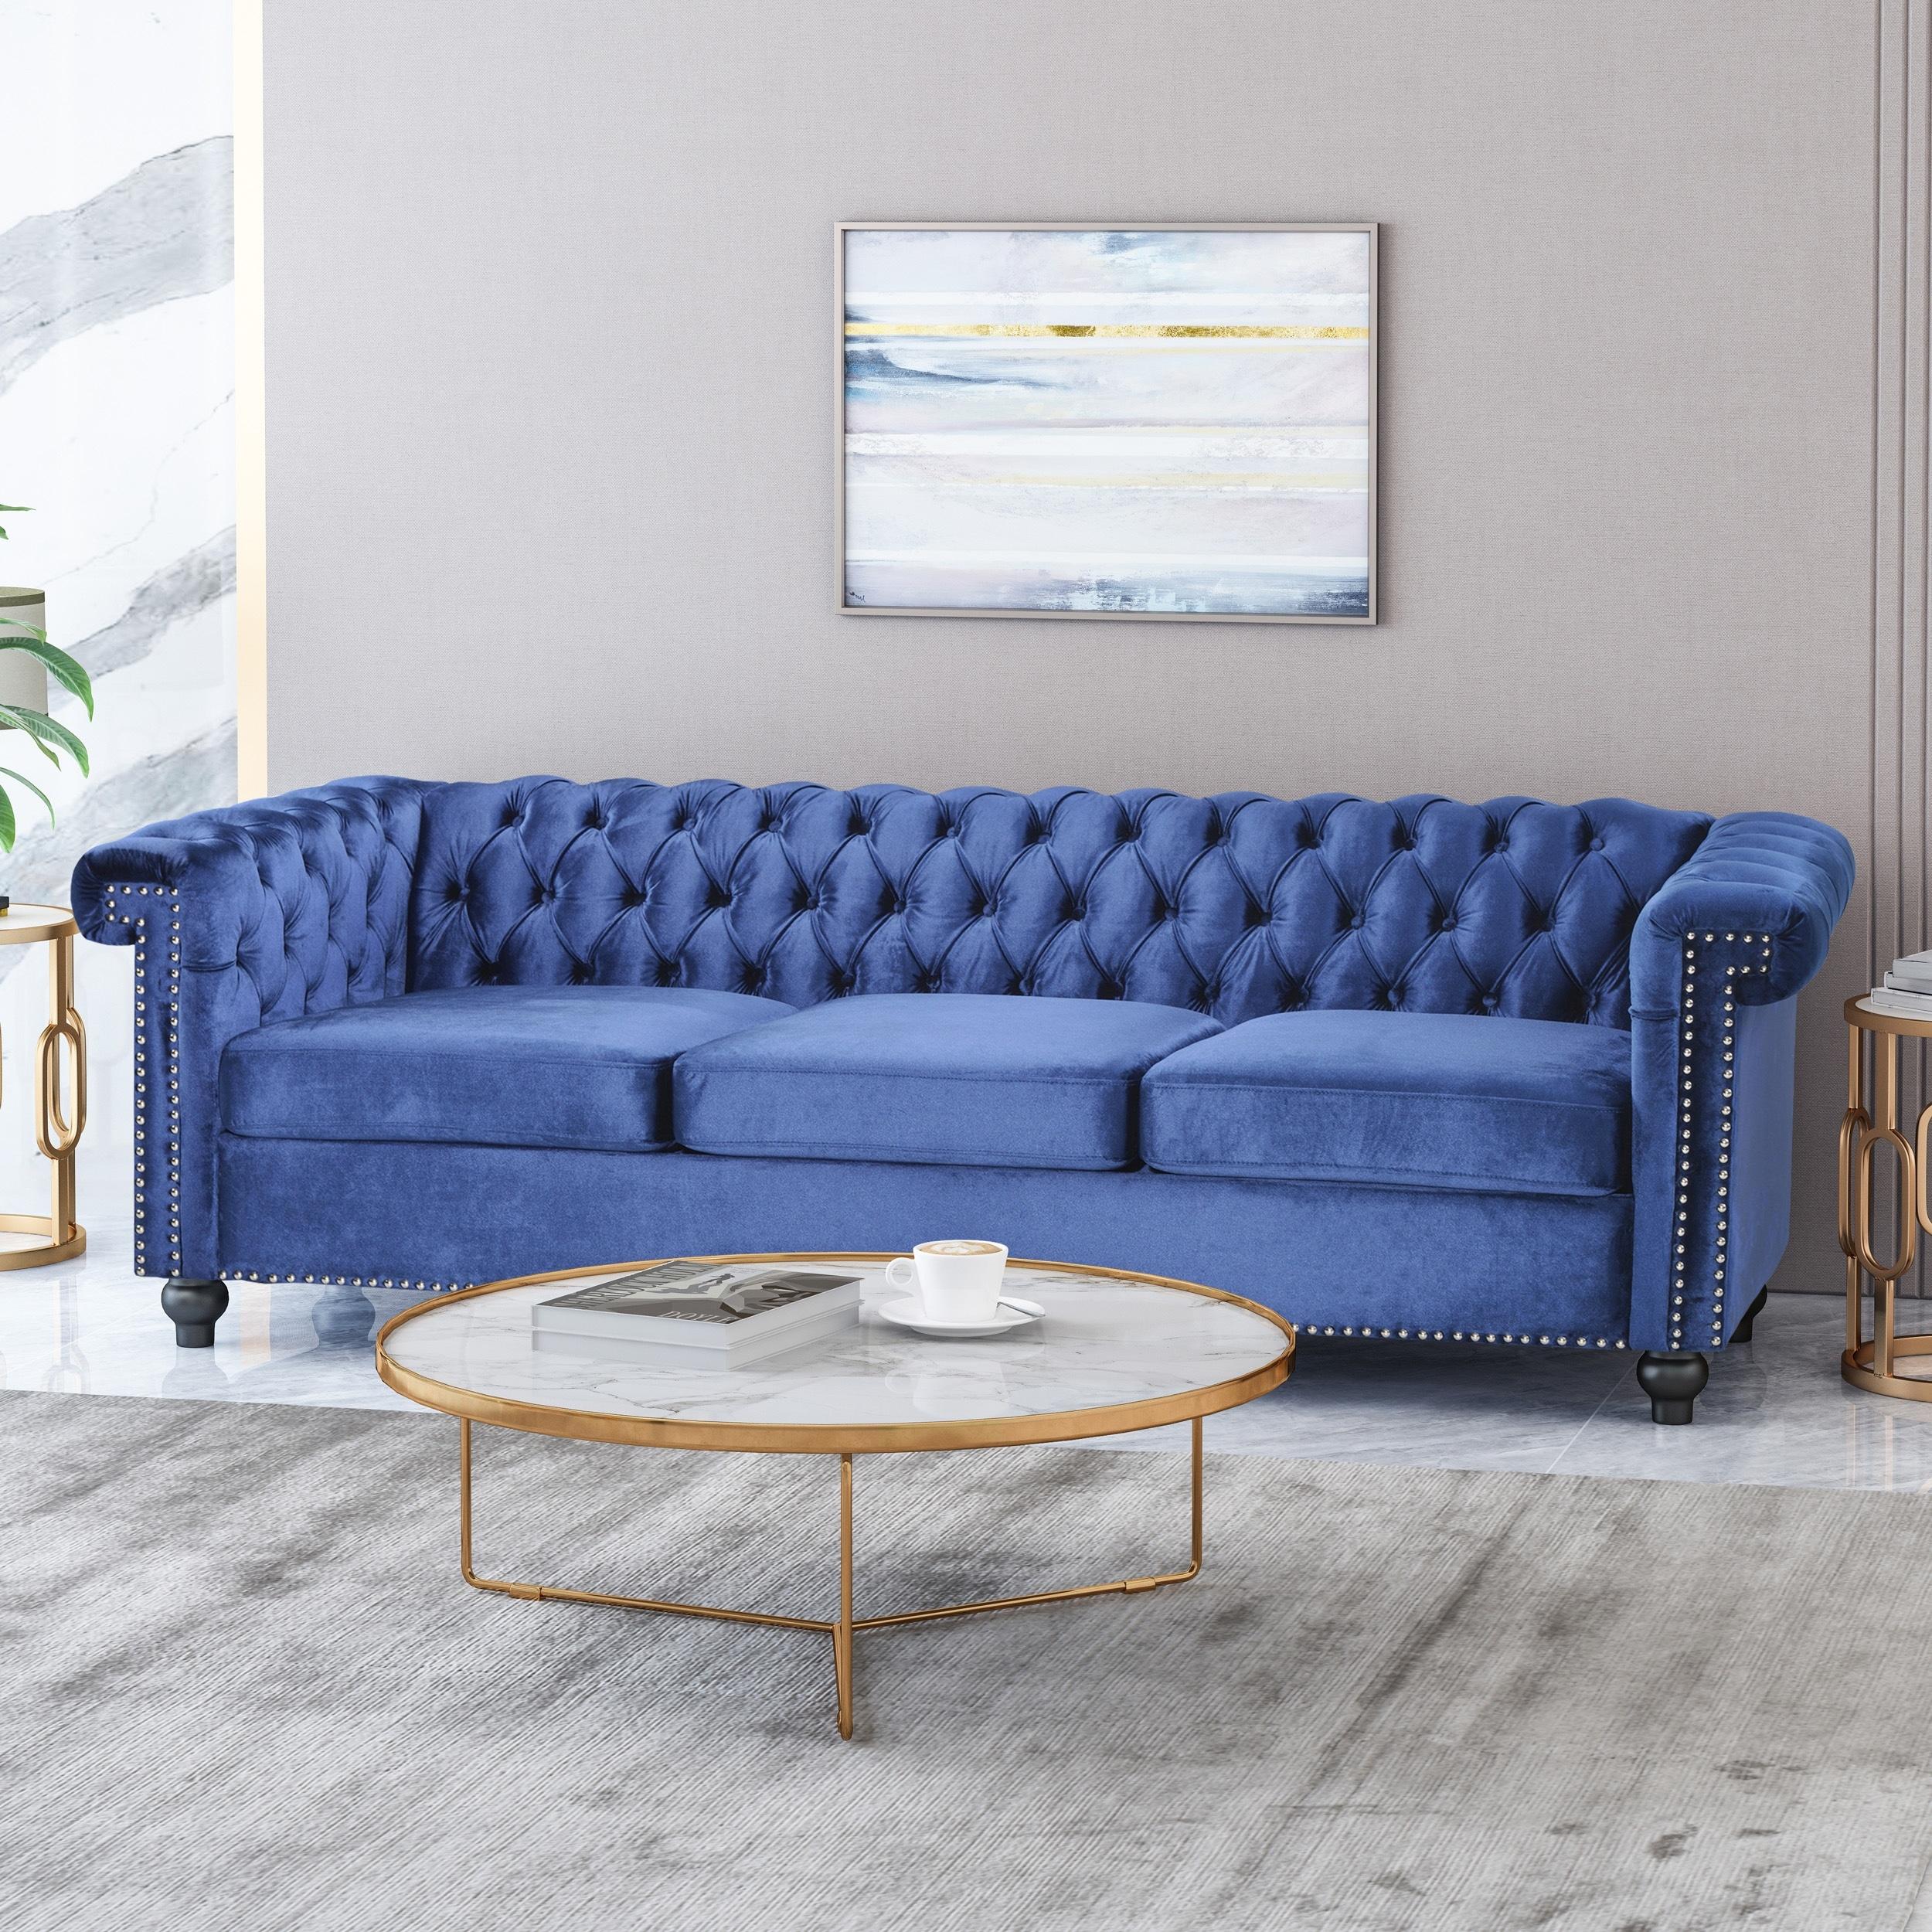 Parkhurst Tufted Chesterfield Velvet 3 Seat Sofa By Christopher Knight Home On Sale Overstock 29919613